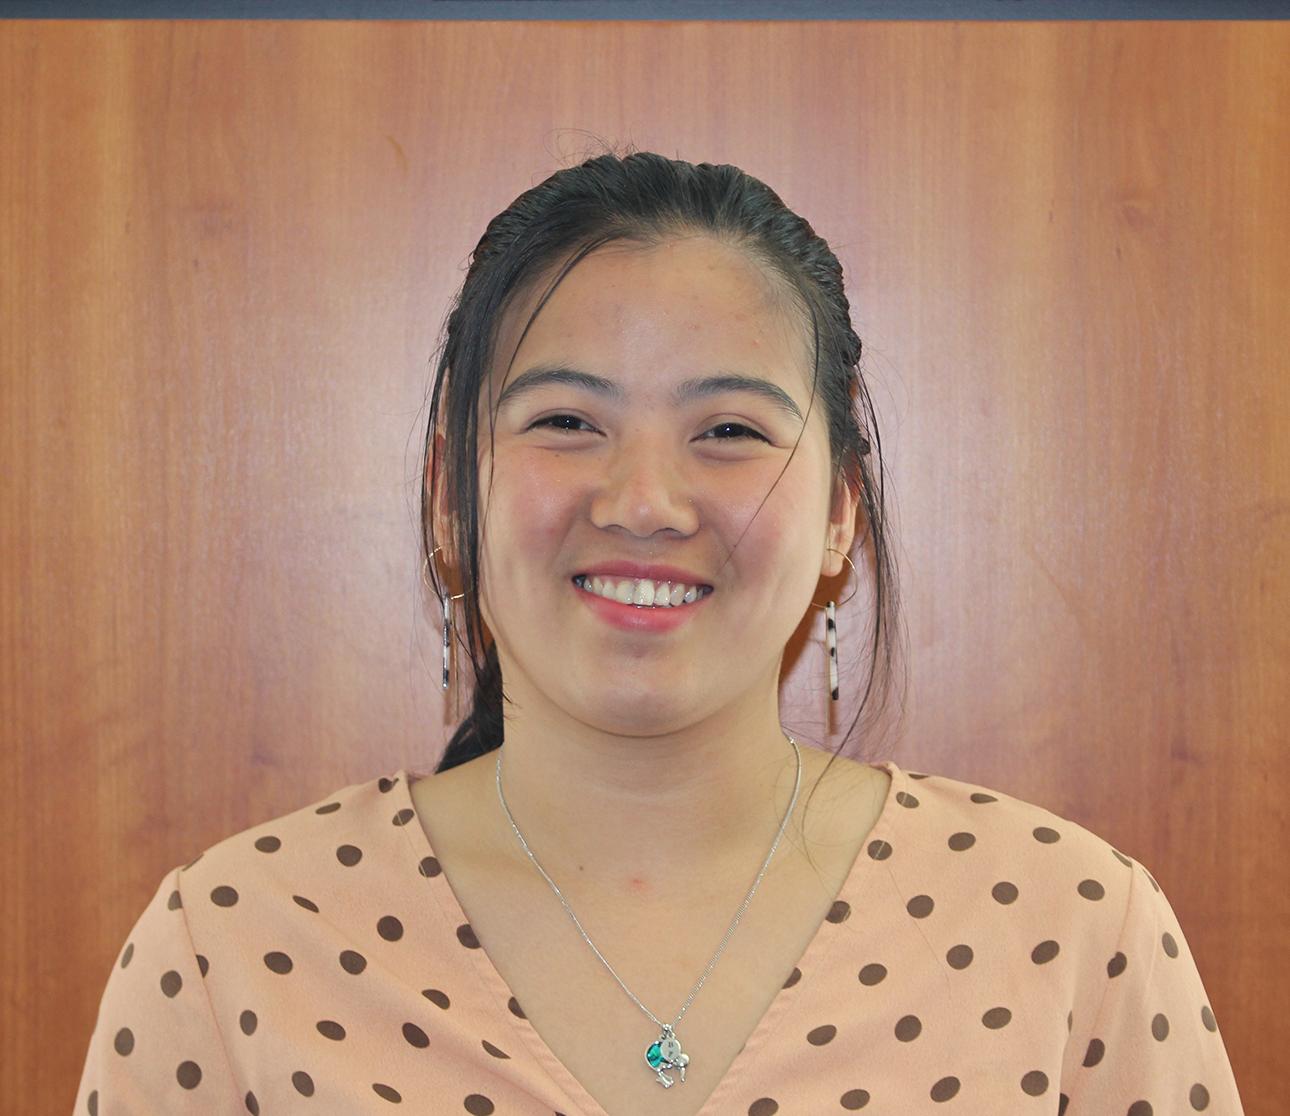 Beatrice Bernarte, Global ambassador Chairperson for Ashburton Youth Council